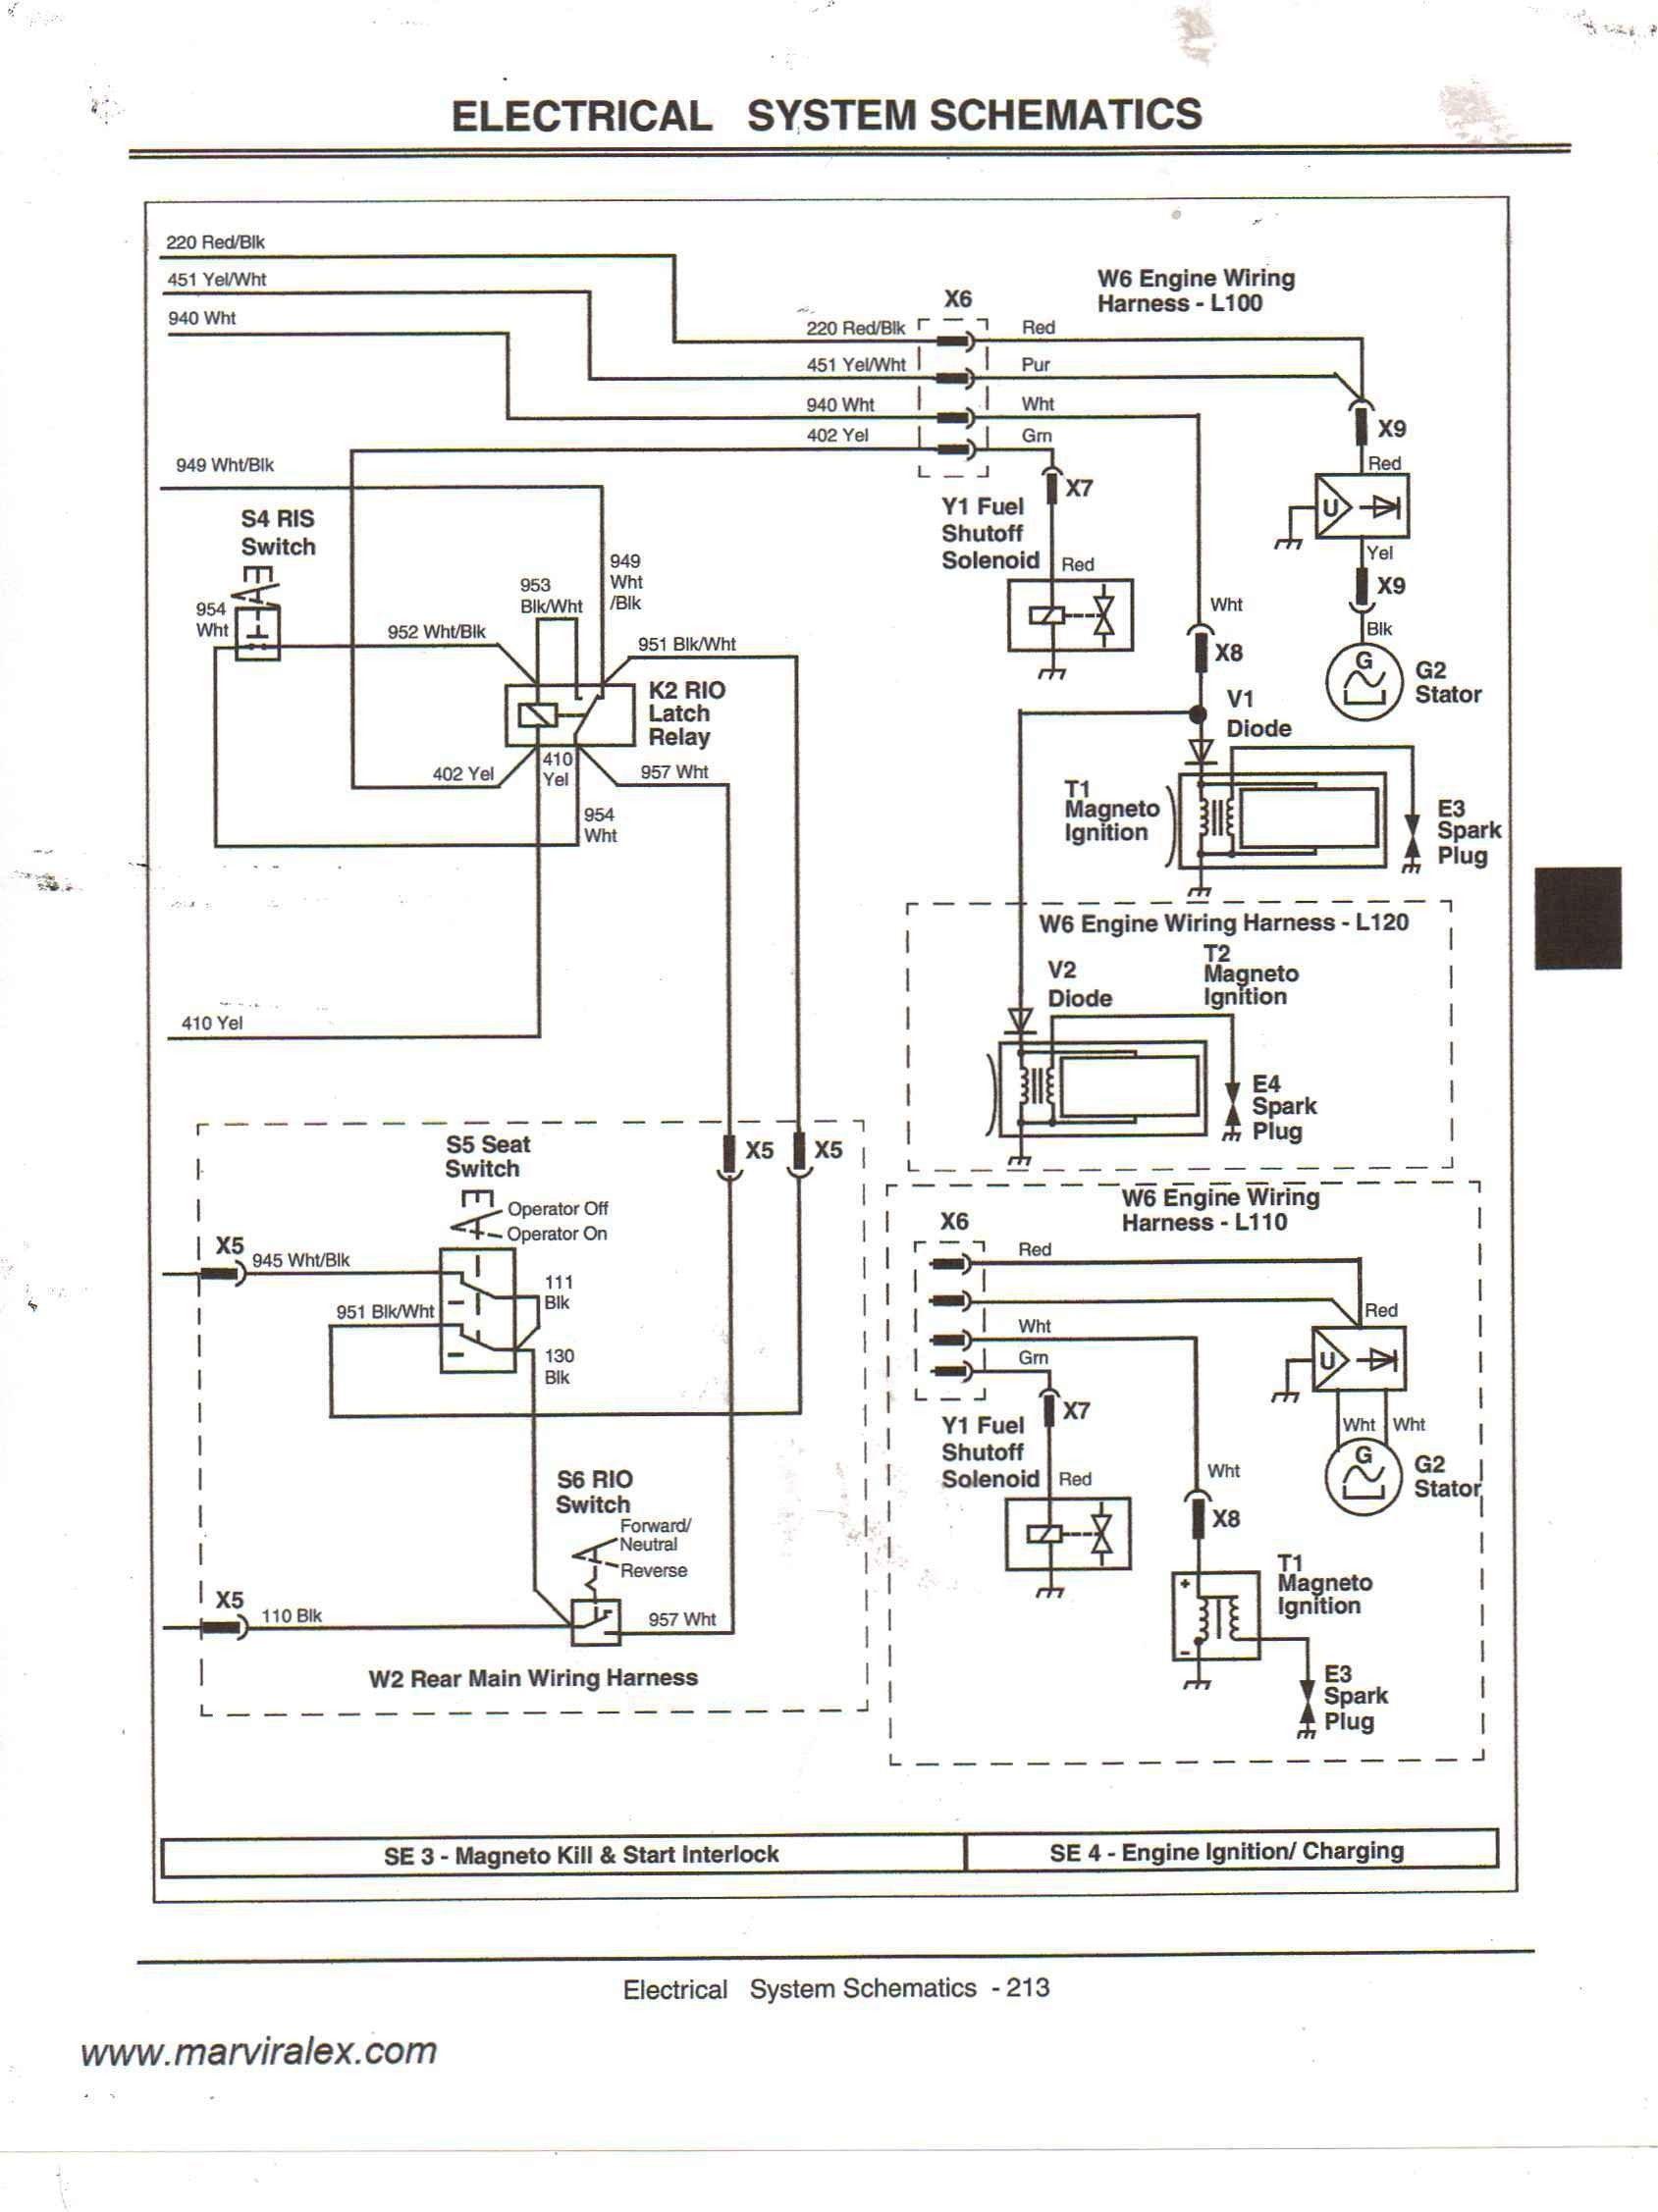 limitorque wiring diagrams wd mxa 01000 0100 wiring diagram database 110v schematic wiring diagram free download [ 1689 x 2254 Pixel ]